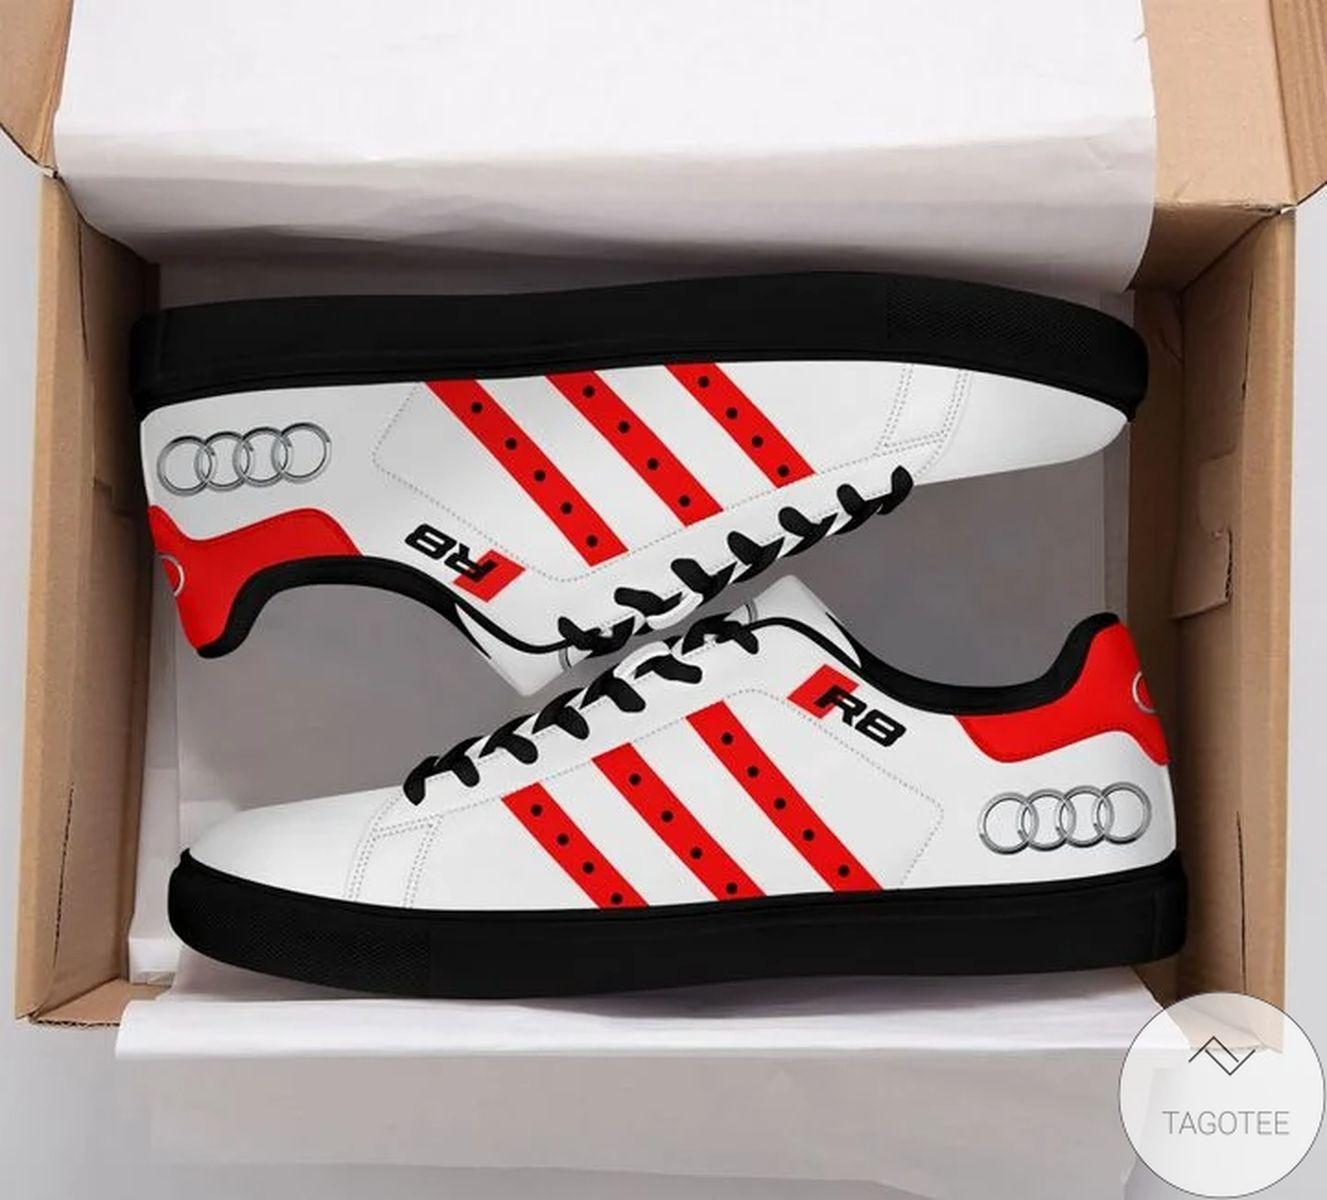 Audi R8 Stan Smith Shoes